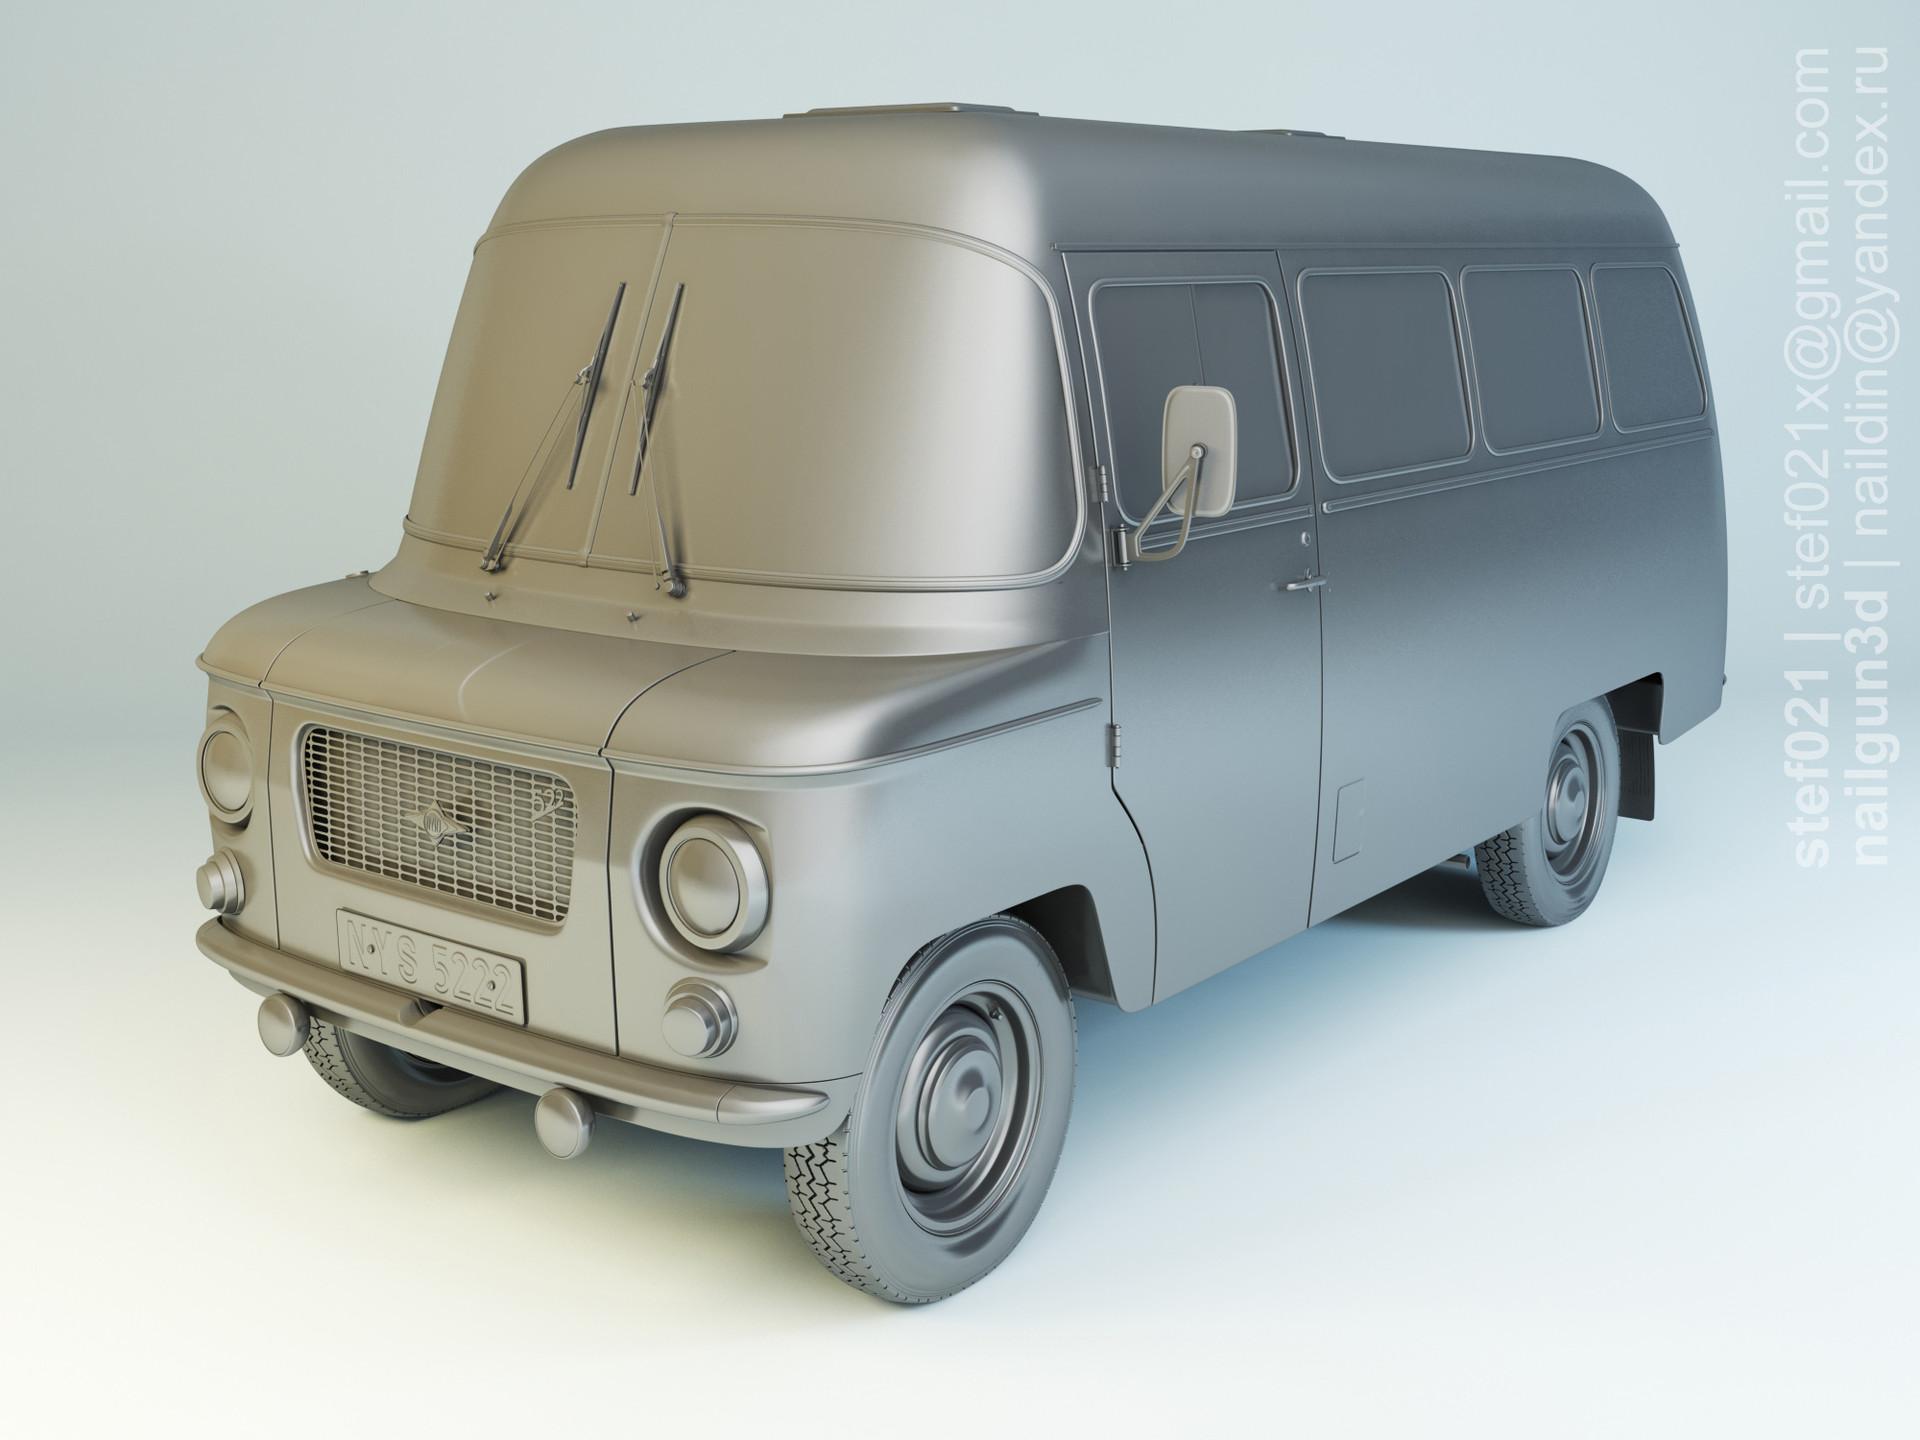 Nail khusnutdinov als 205 001 nysa 522 modelling 0